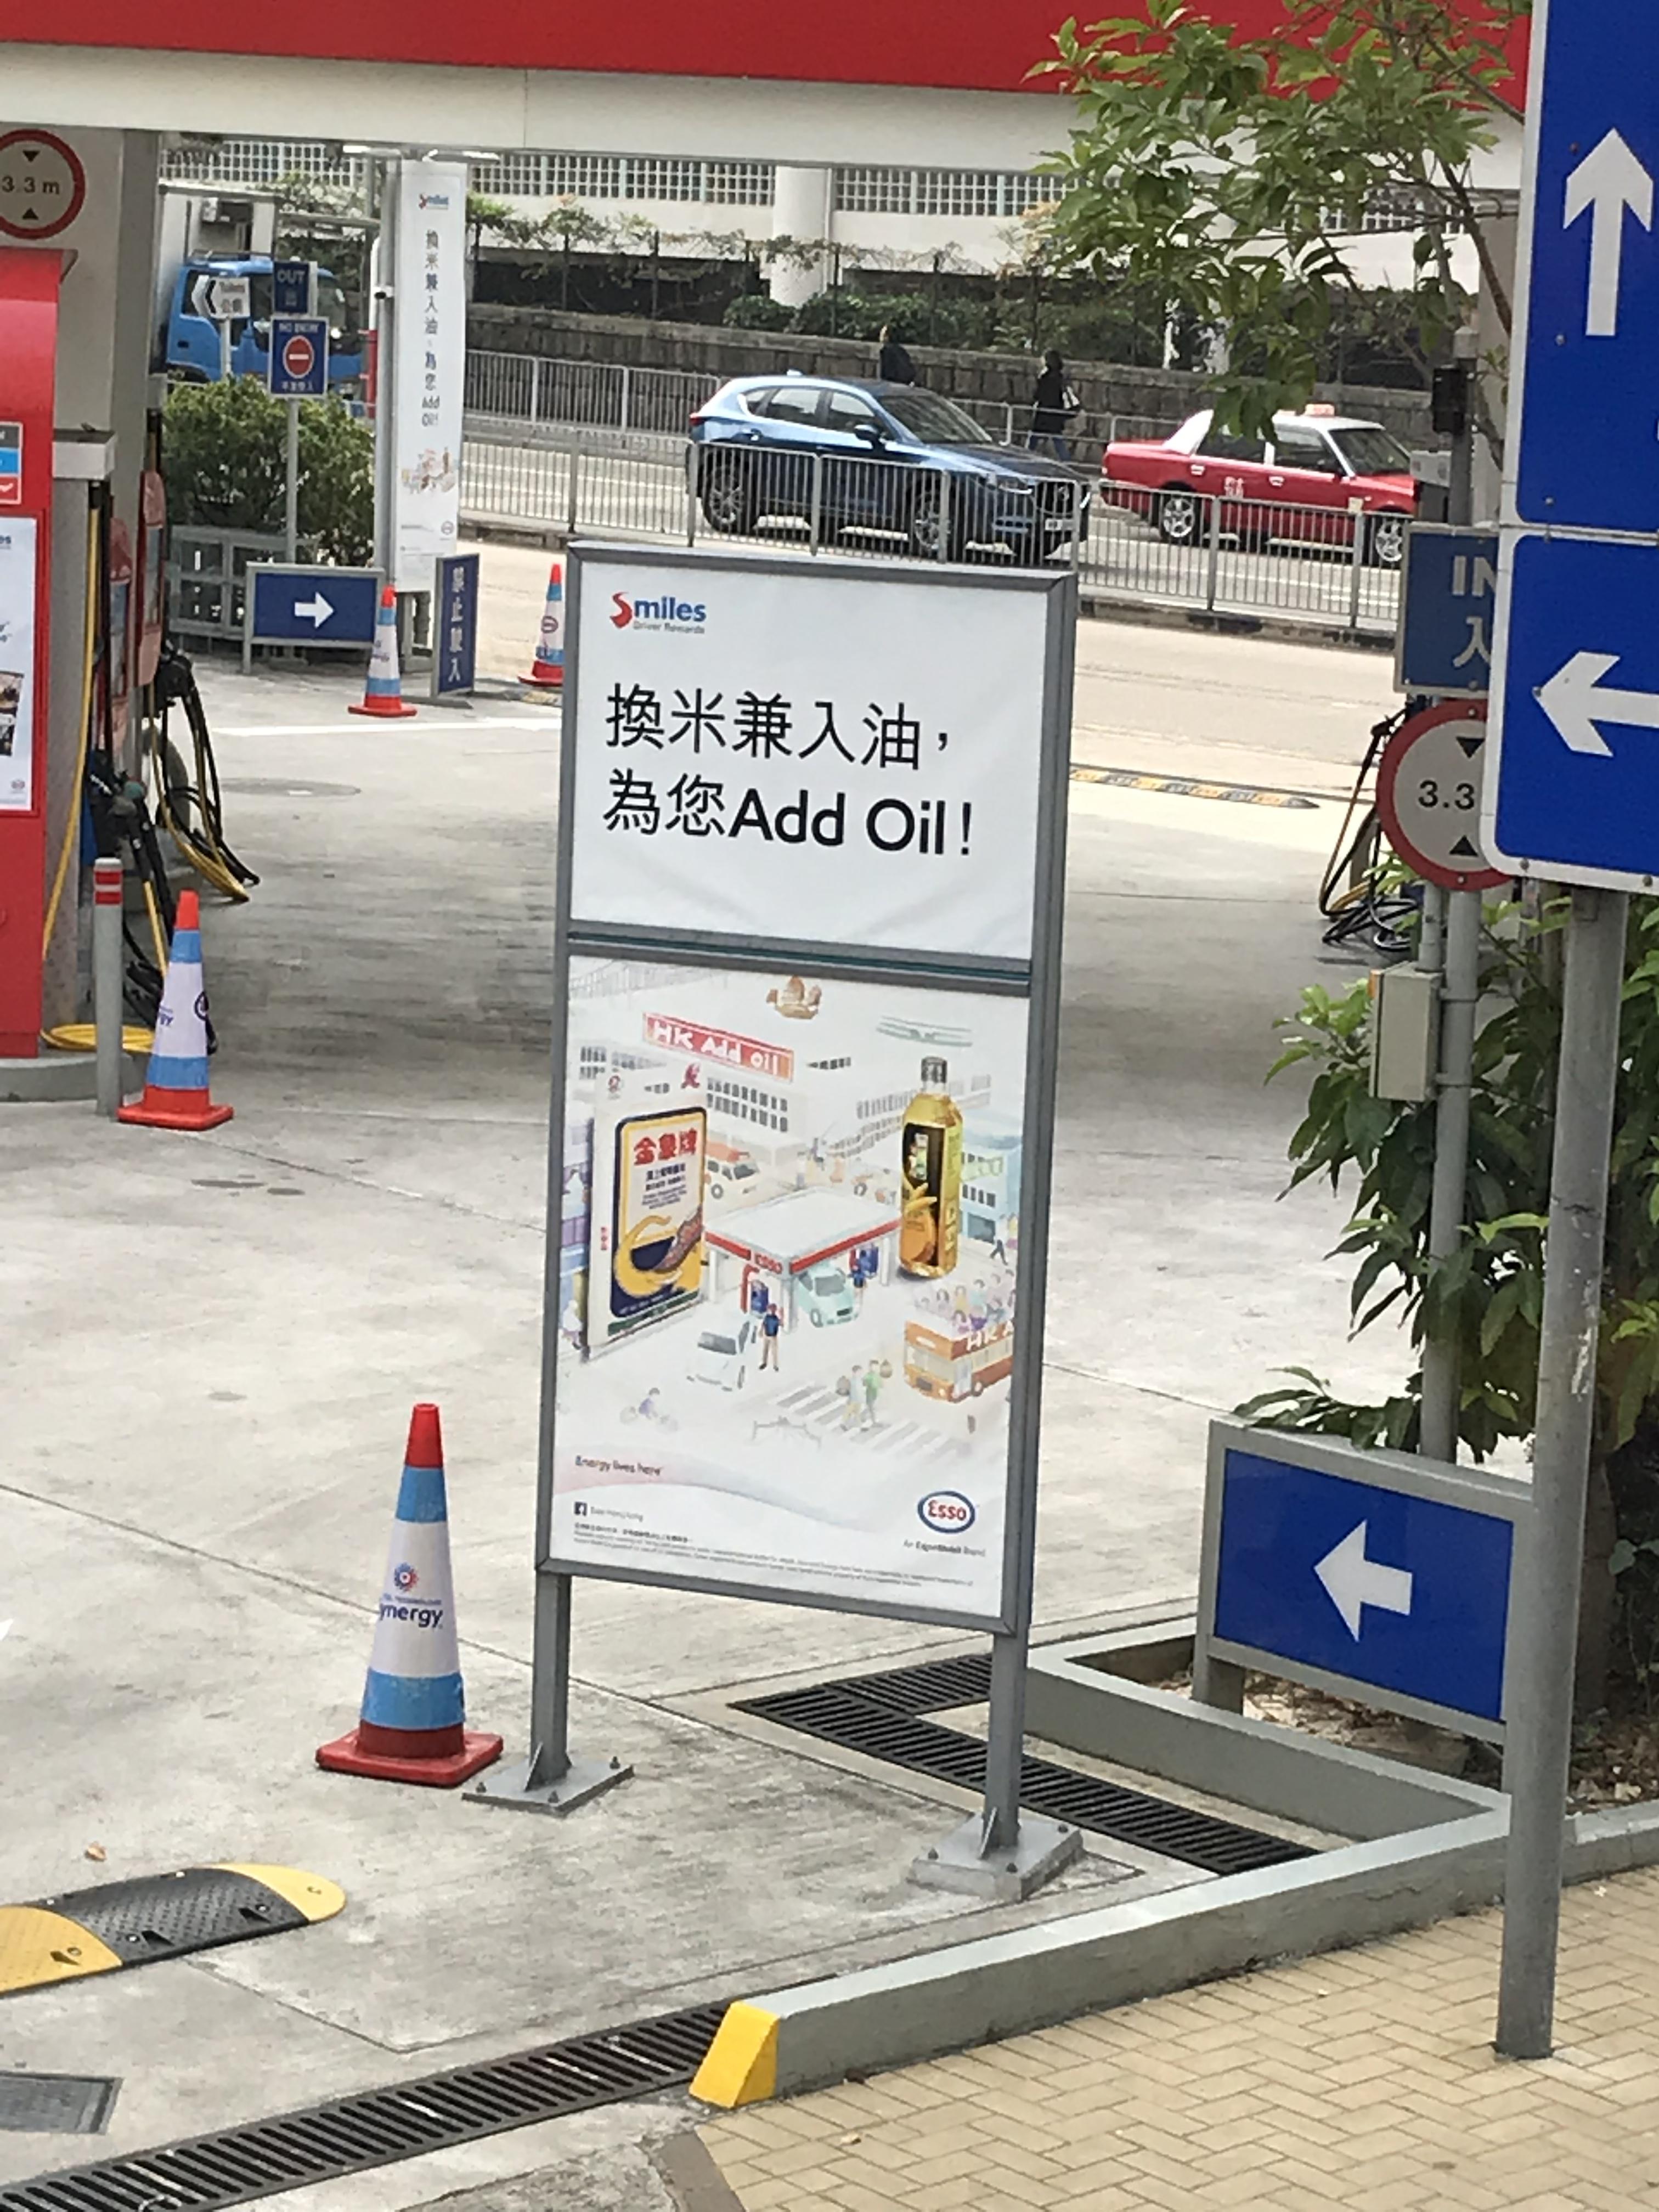 Add oil - Wikipedia